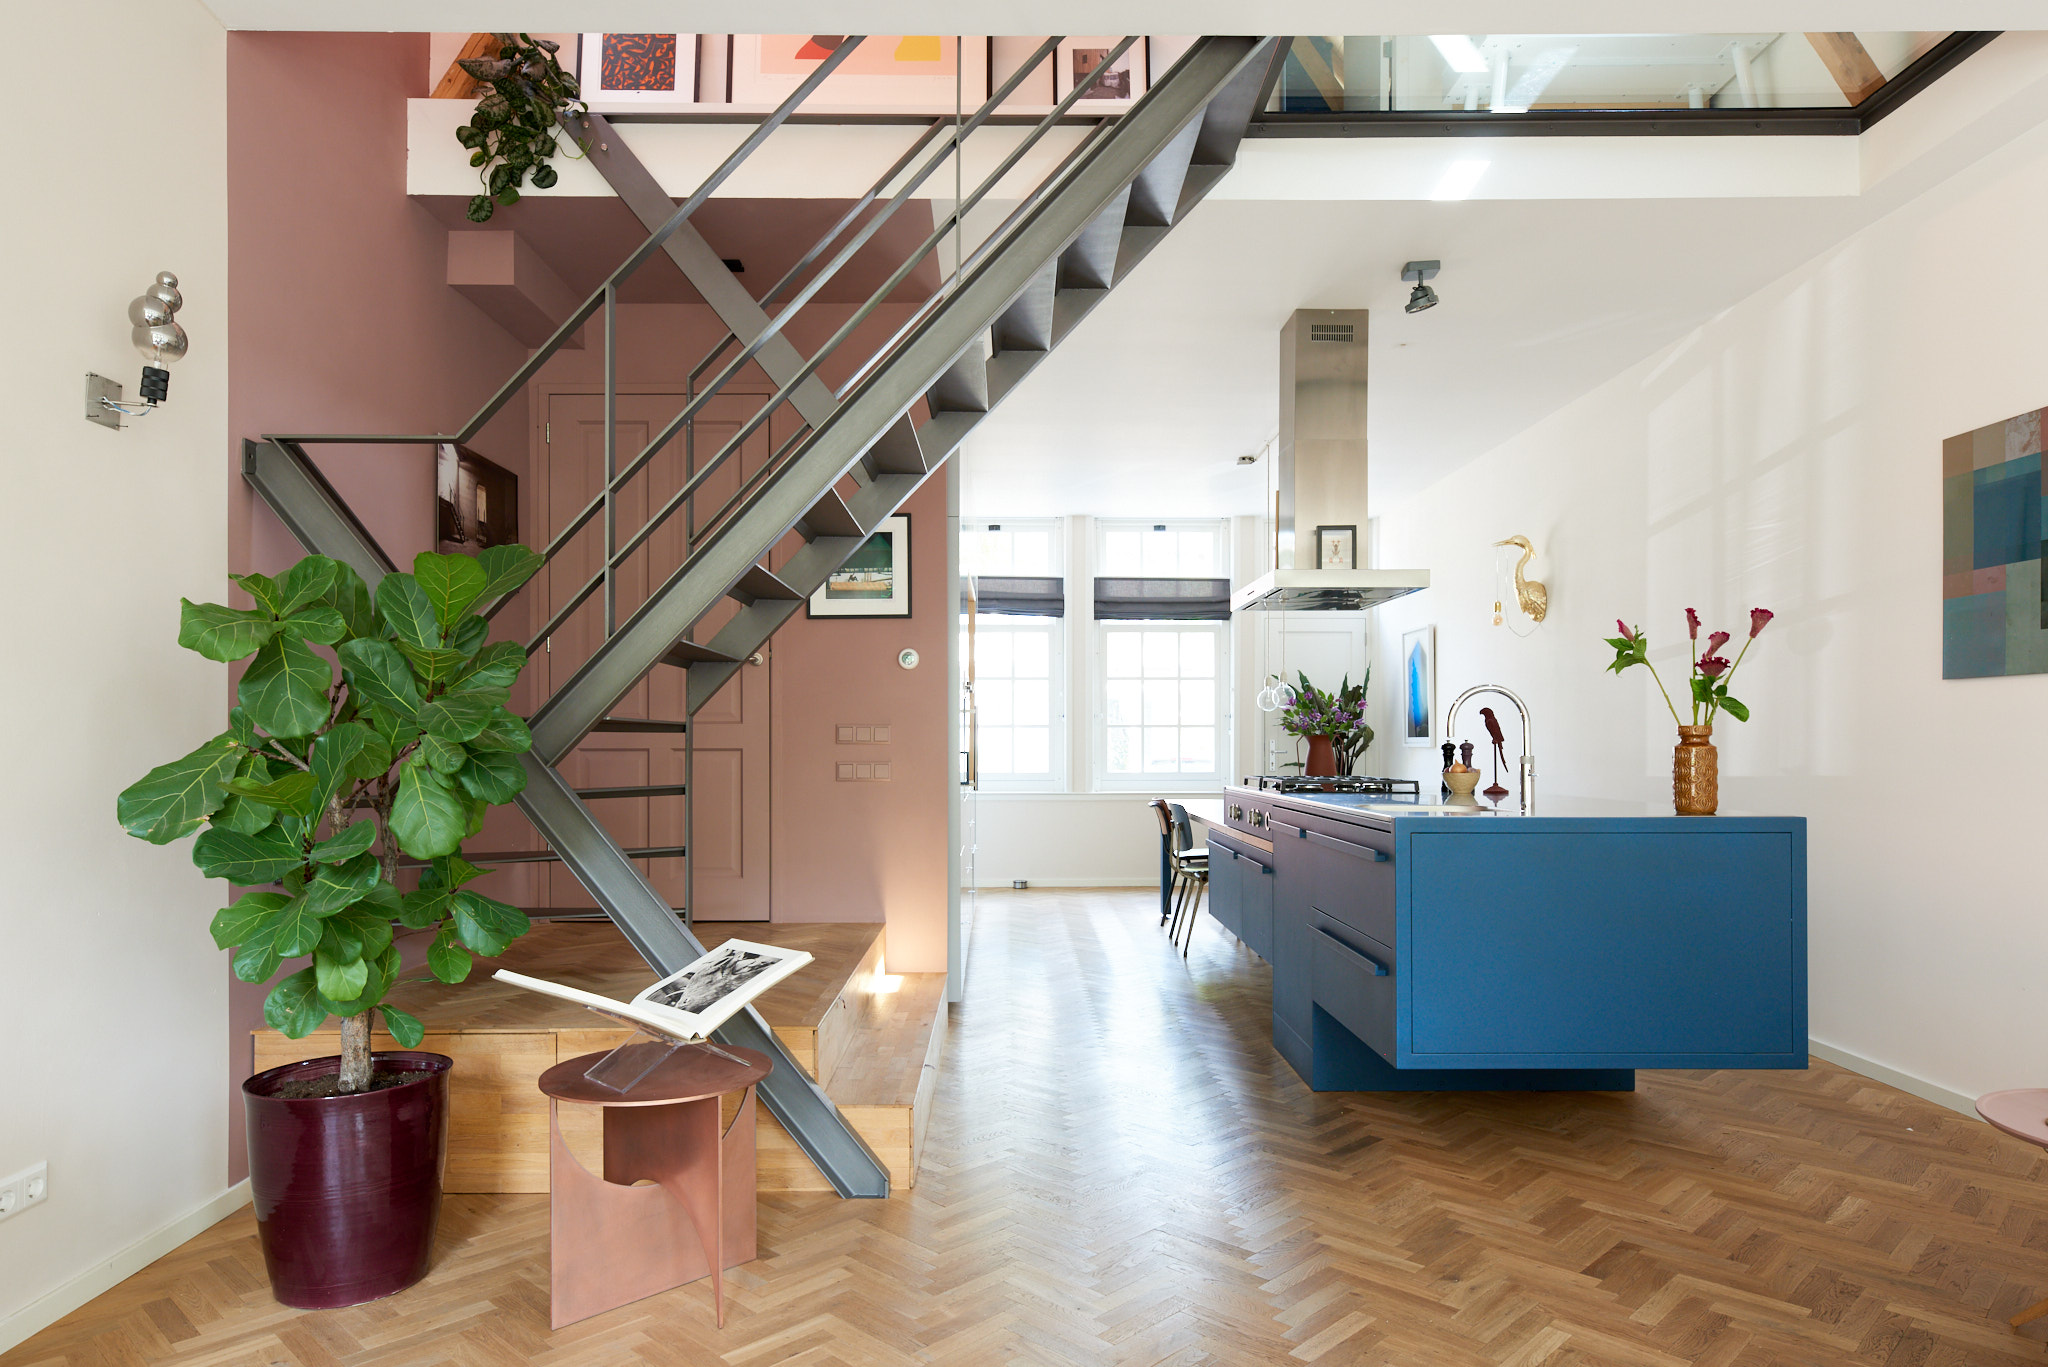 Stalen design keuken en trap in monumentaal huis